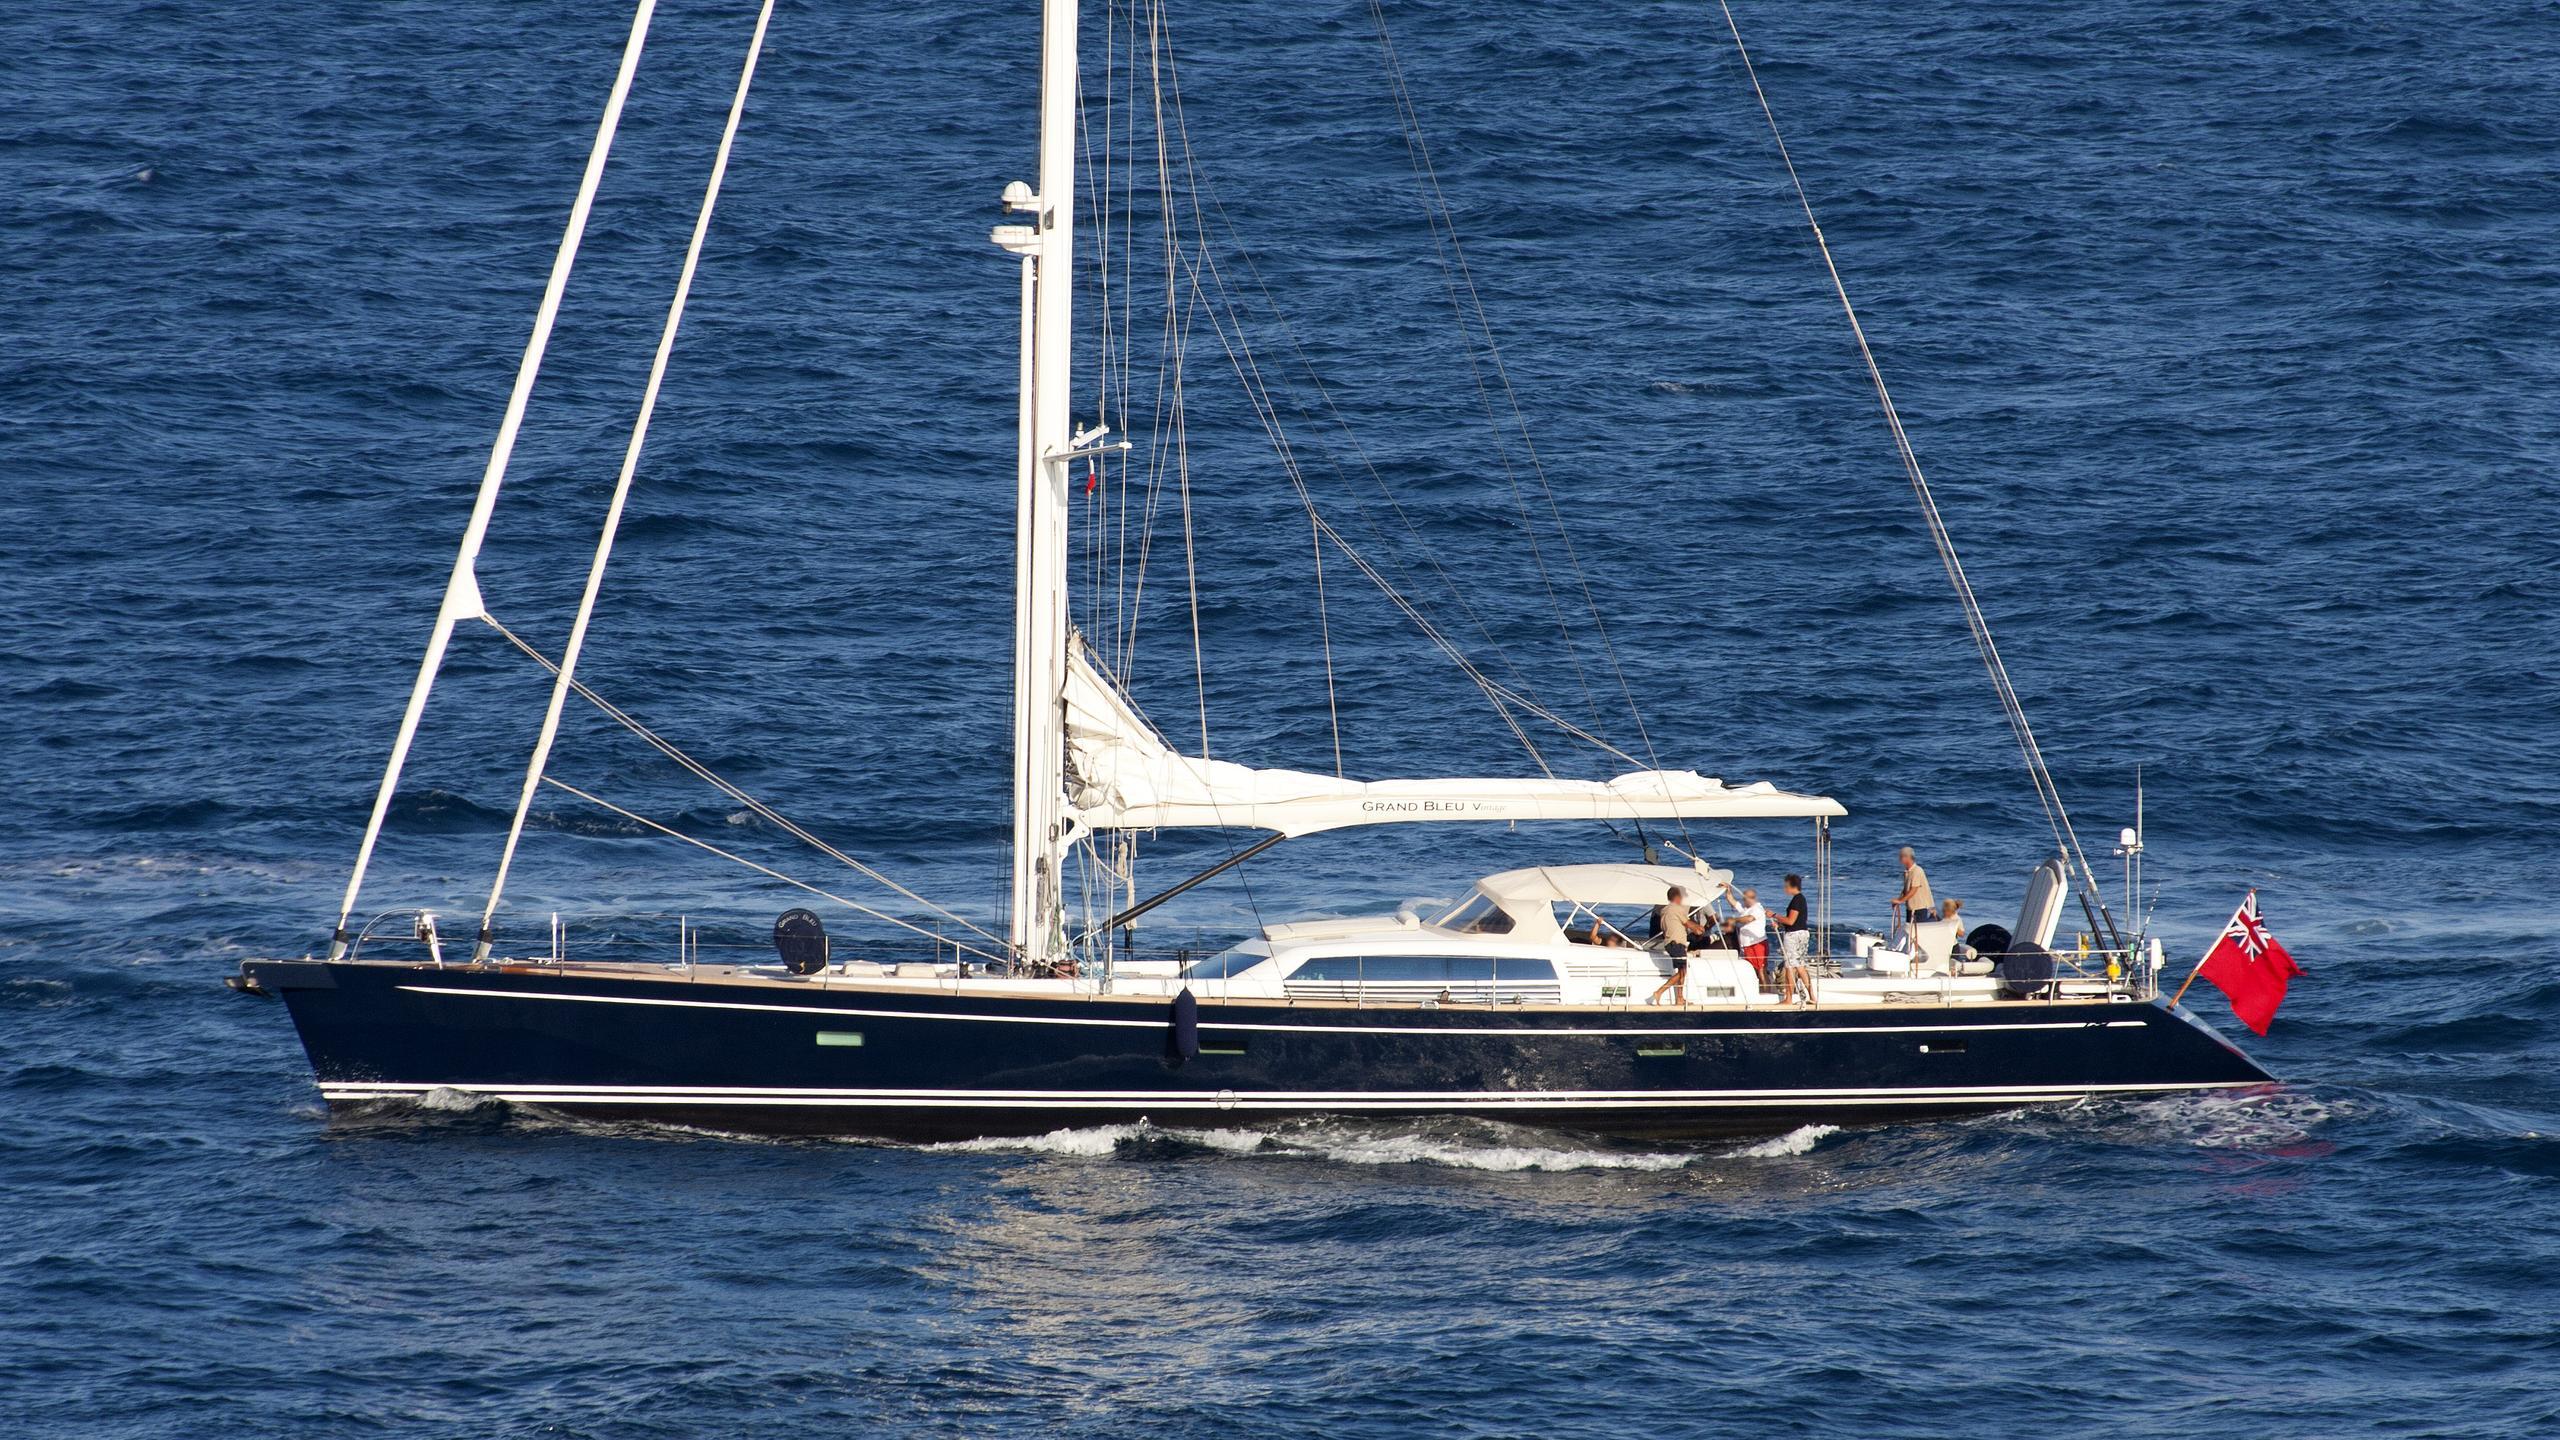 grand-bleu-sailing-yacht-vintage-cnb-2003-29m-cruising